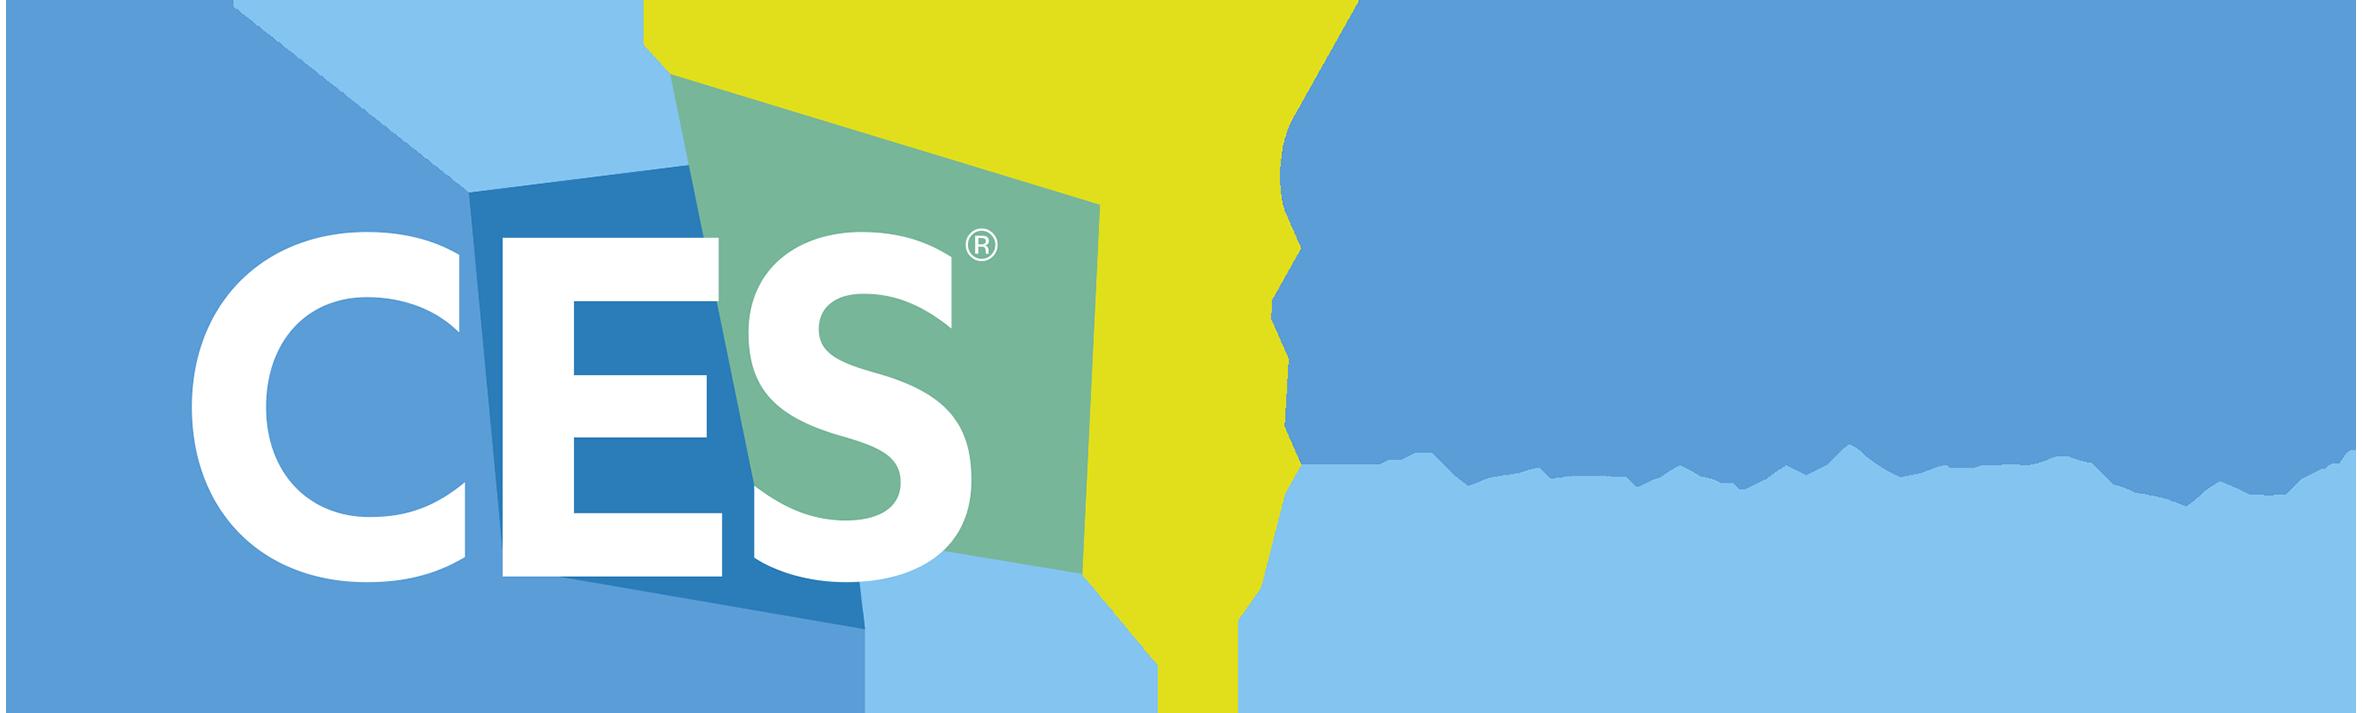 CES_CTA_Logo_Combo_RBG